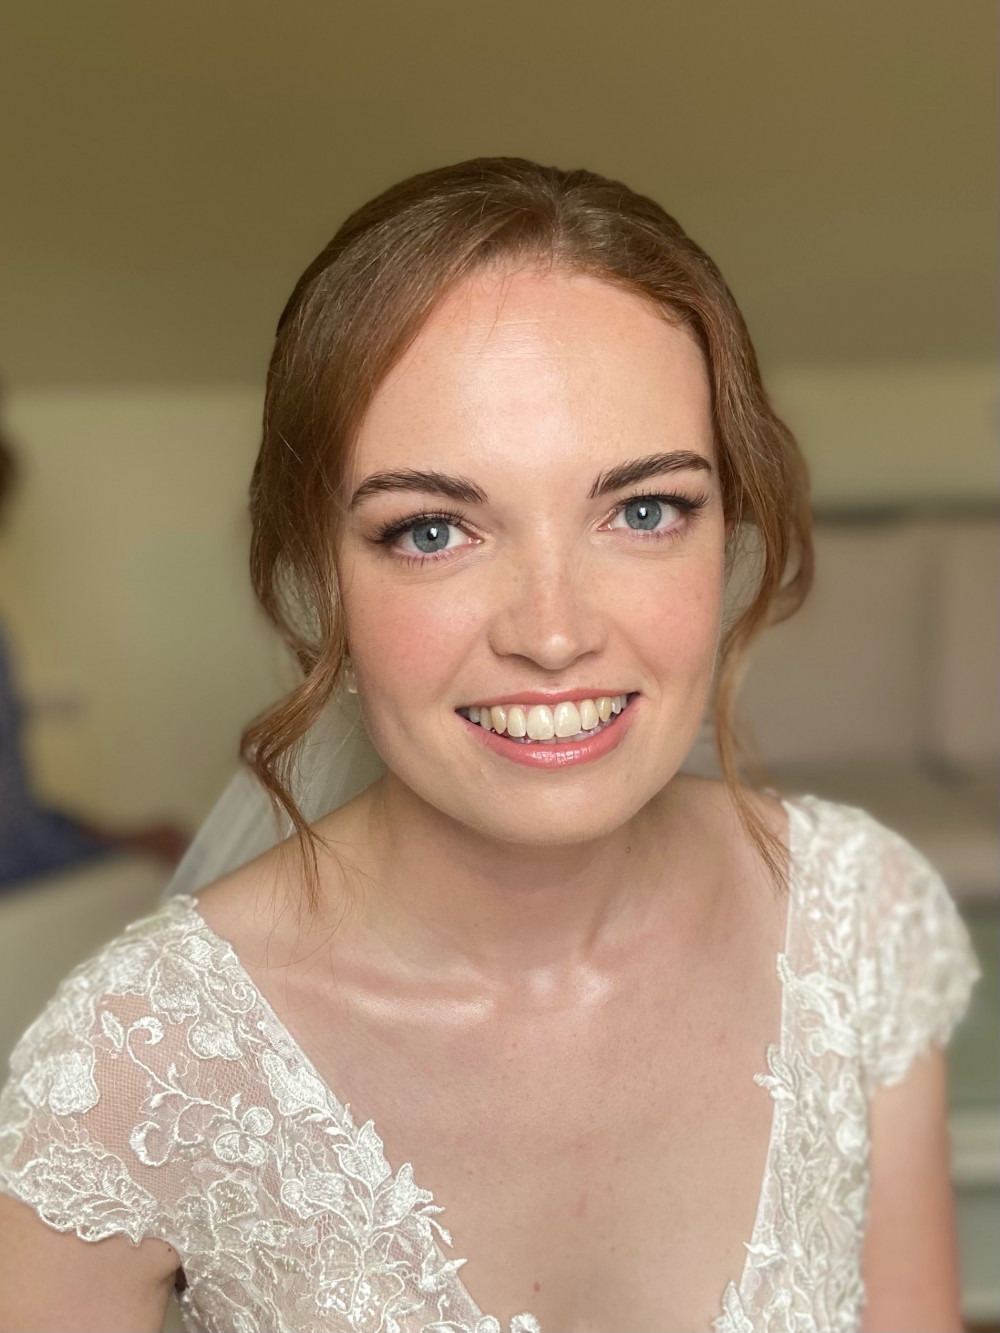 Fresh, glowing, natural bridal makeup and textured wedding hair. - Make Me Bridal Artist: Jessica Makeup and Hairstyling. #naturalmakeup #bridalmakeup #glow #weddinghair #bridalhair #perfectmakeup #bridalhairandmakeup #elegantmakeup #romantic #glowingskin #freshmakeup #hampshiremakeupartist #weddingmakeupartisthampshire #hampshirehair #hampshirewedding #hairartisthampshire